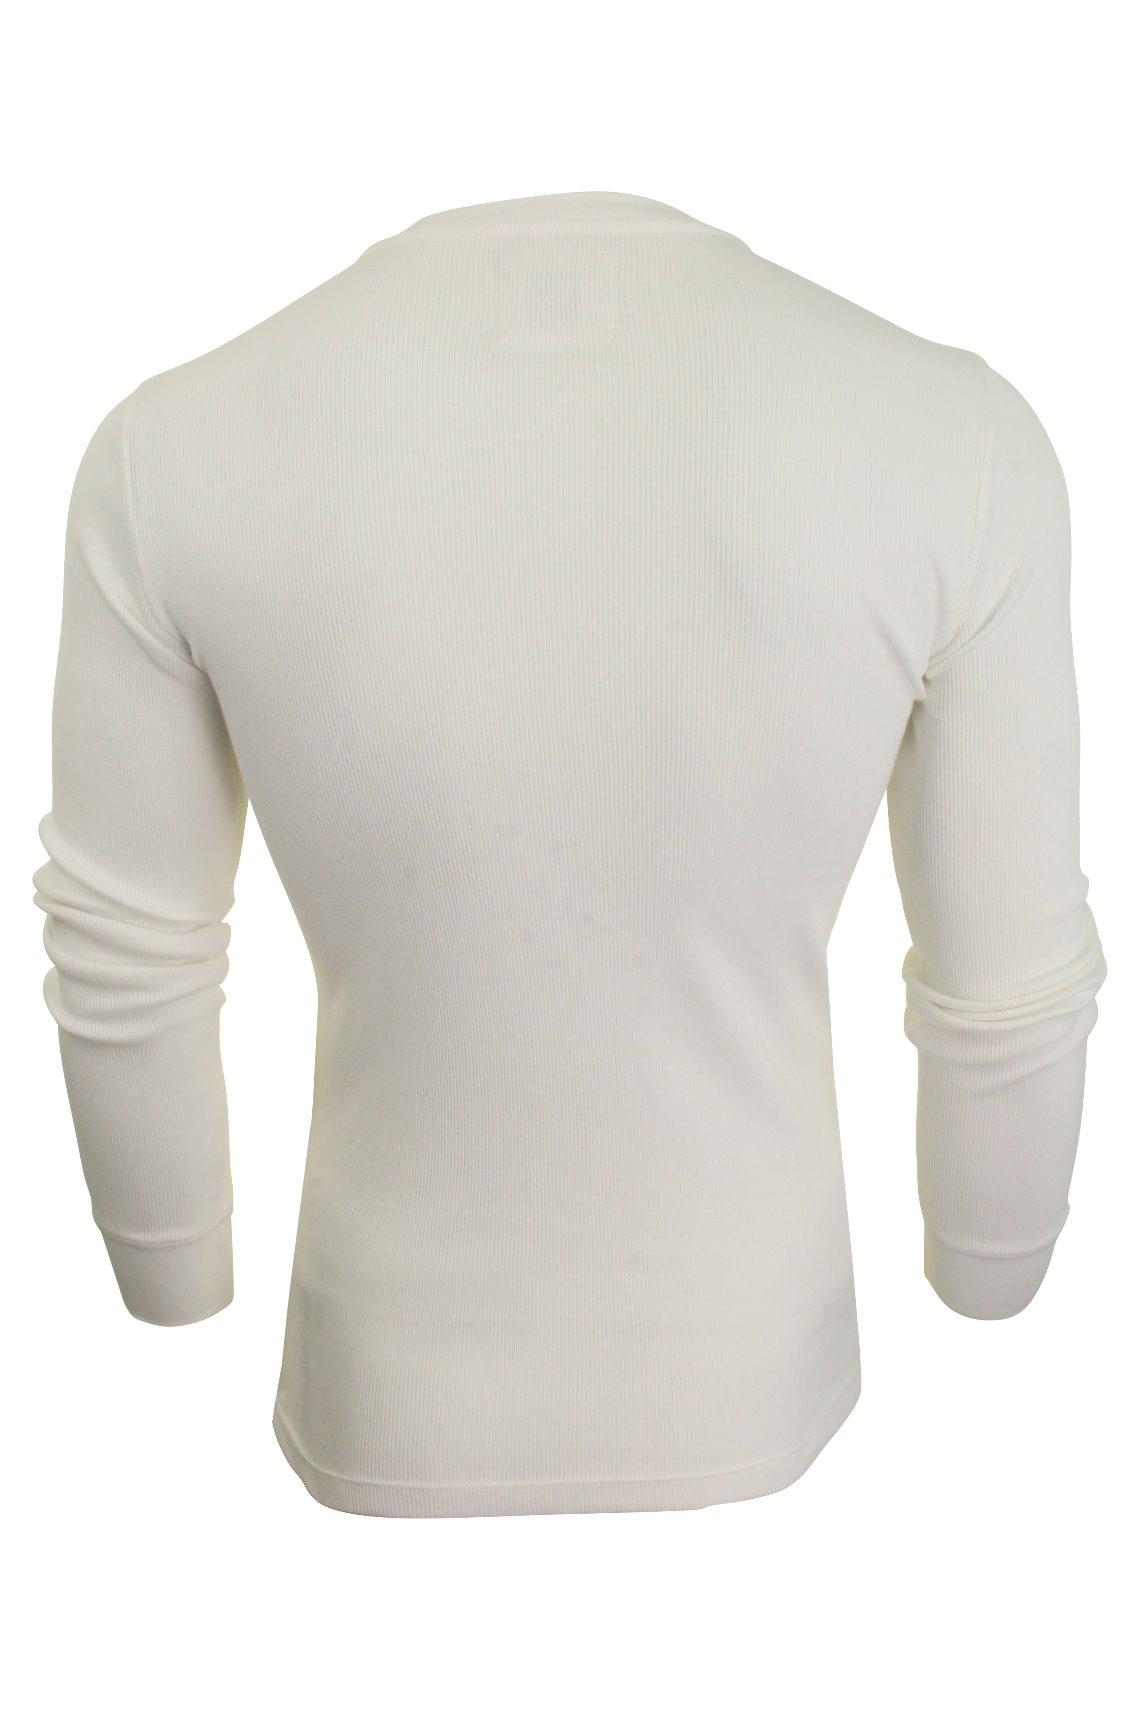 Levi-039-s-Homme-Grandad-039-300LS-Henley-039-Rib-T-shirt-a-manches-longues miniature 12